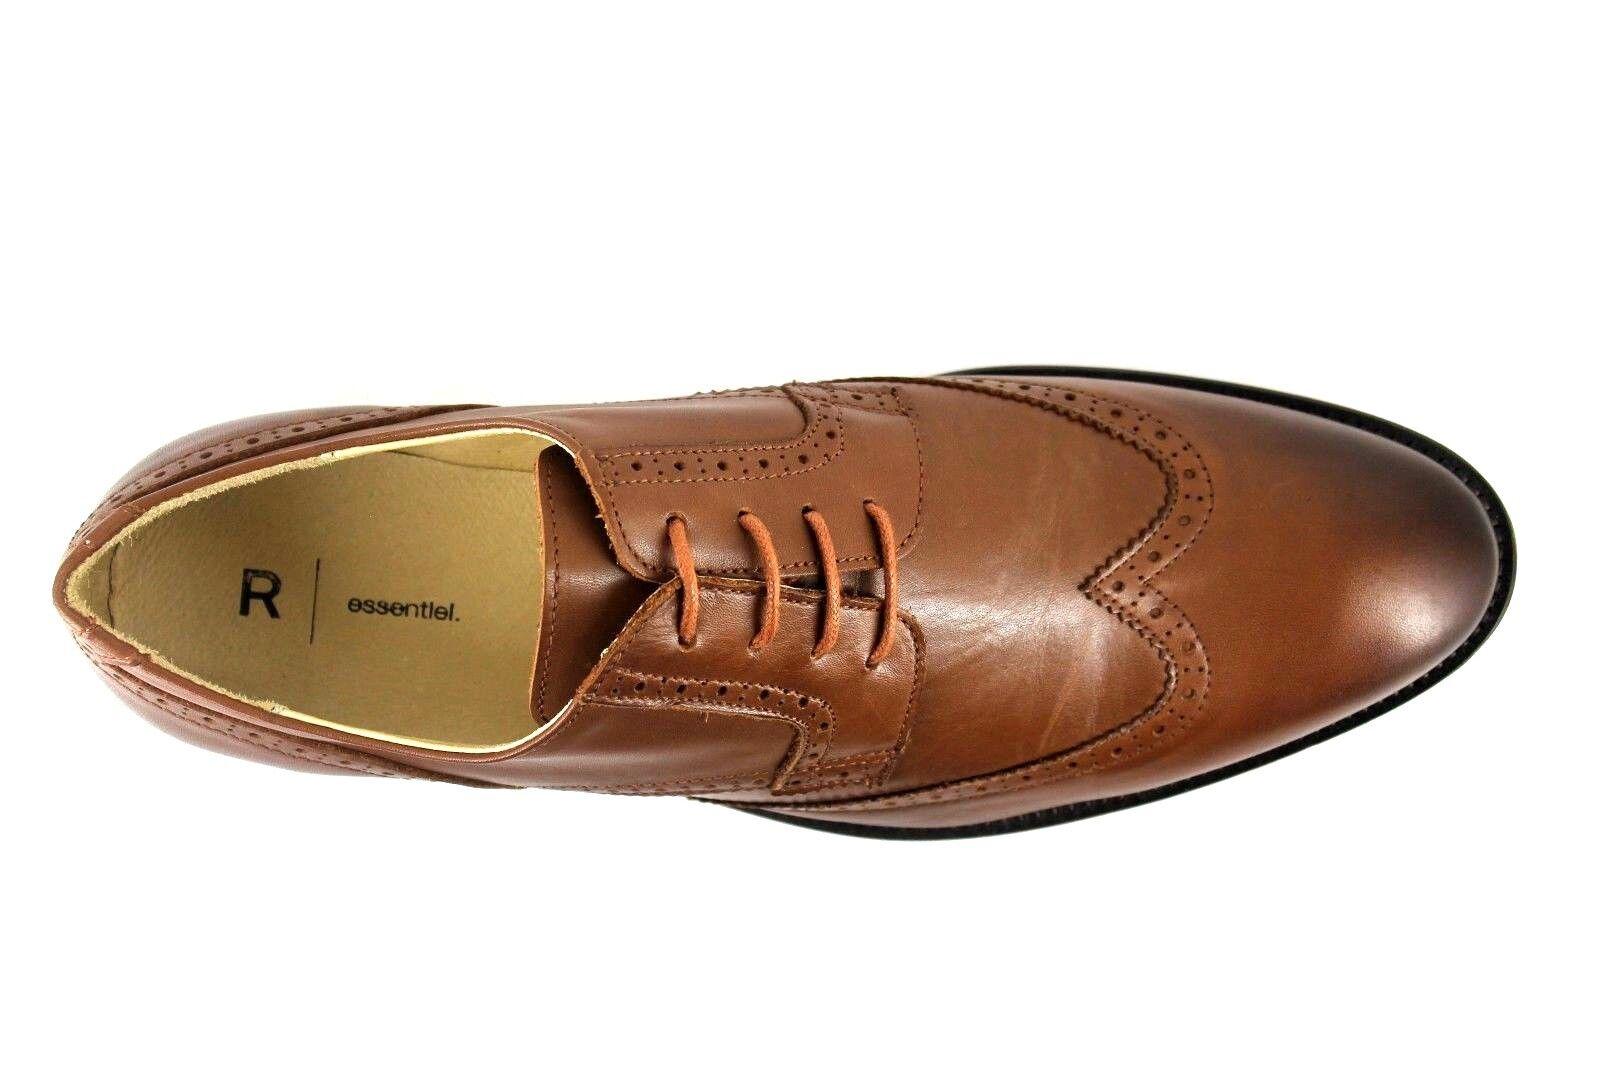 La ROToute EU  Uomo UK 9 EU ROToute 43 Braun Leder Lace Up Brogue Schuhes Smart Formal Work 348c2c